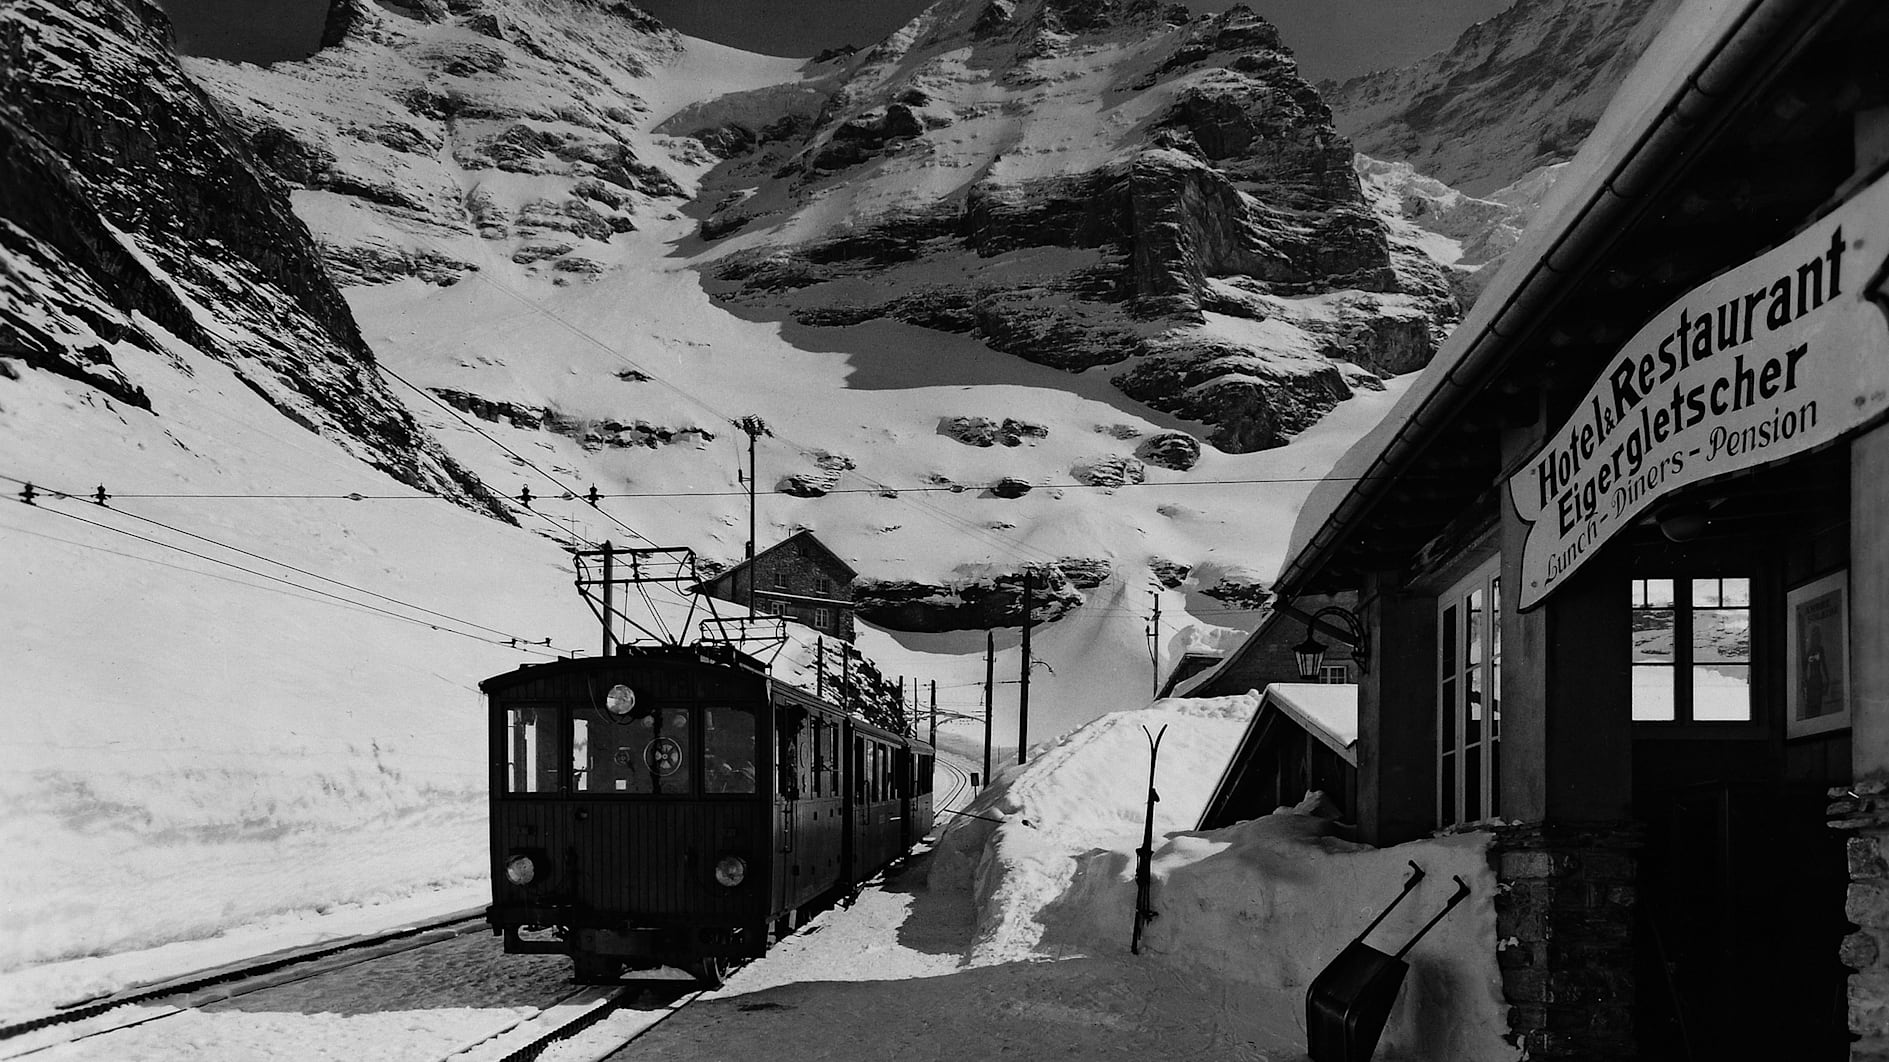 Jungfrau bahn nostalgie eigergletscher toursimus winterbetrieb